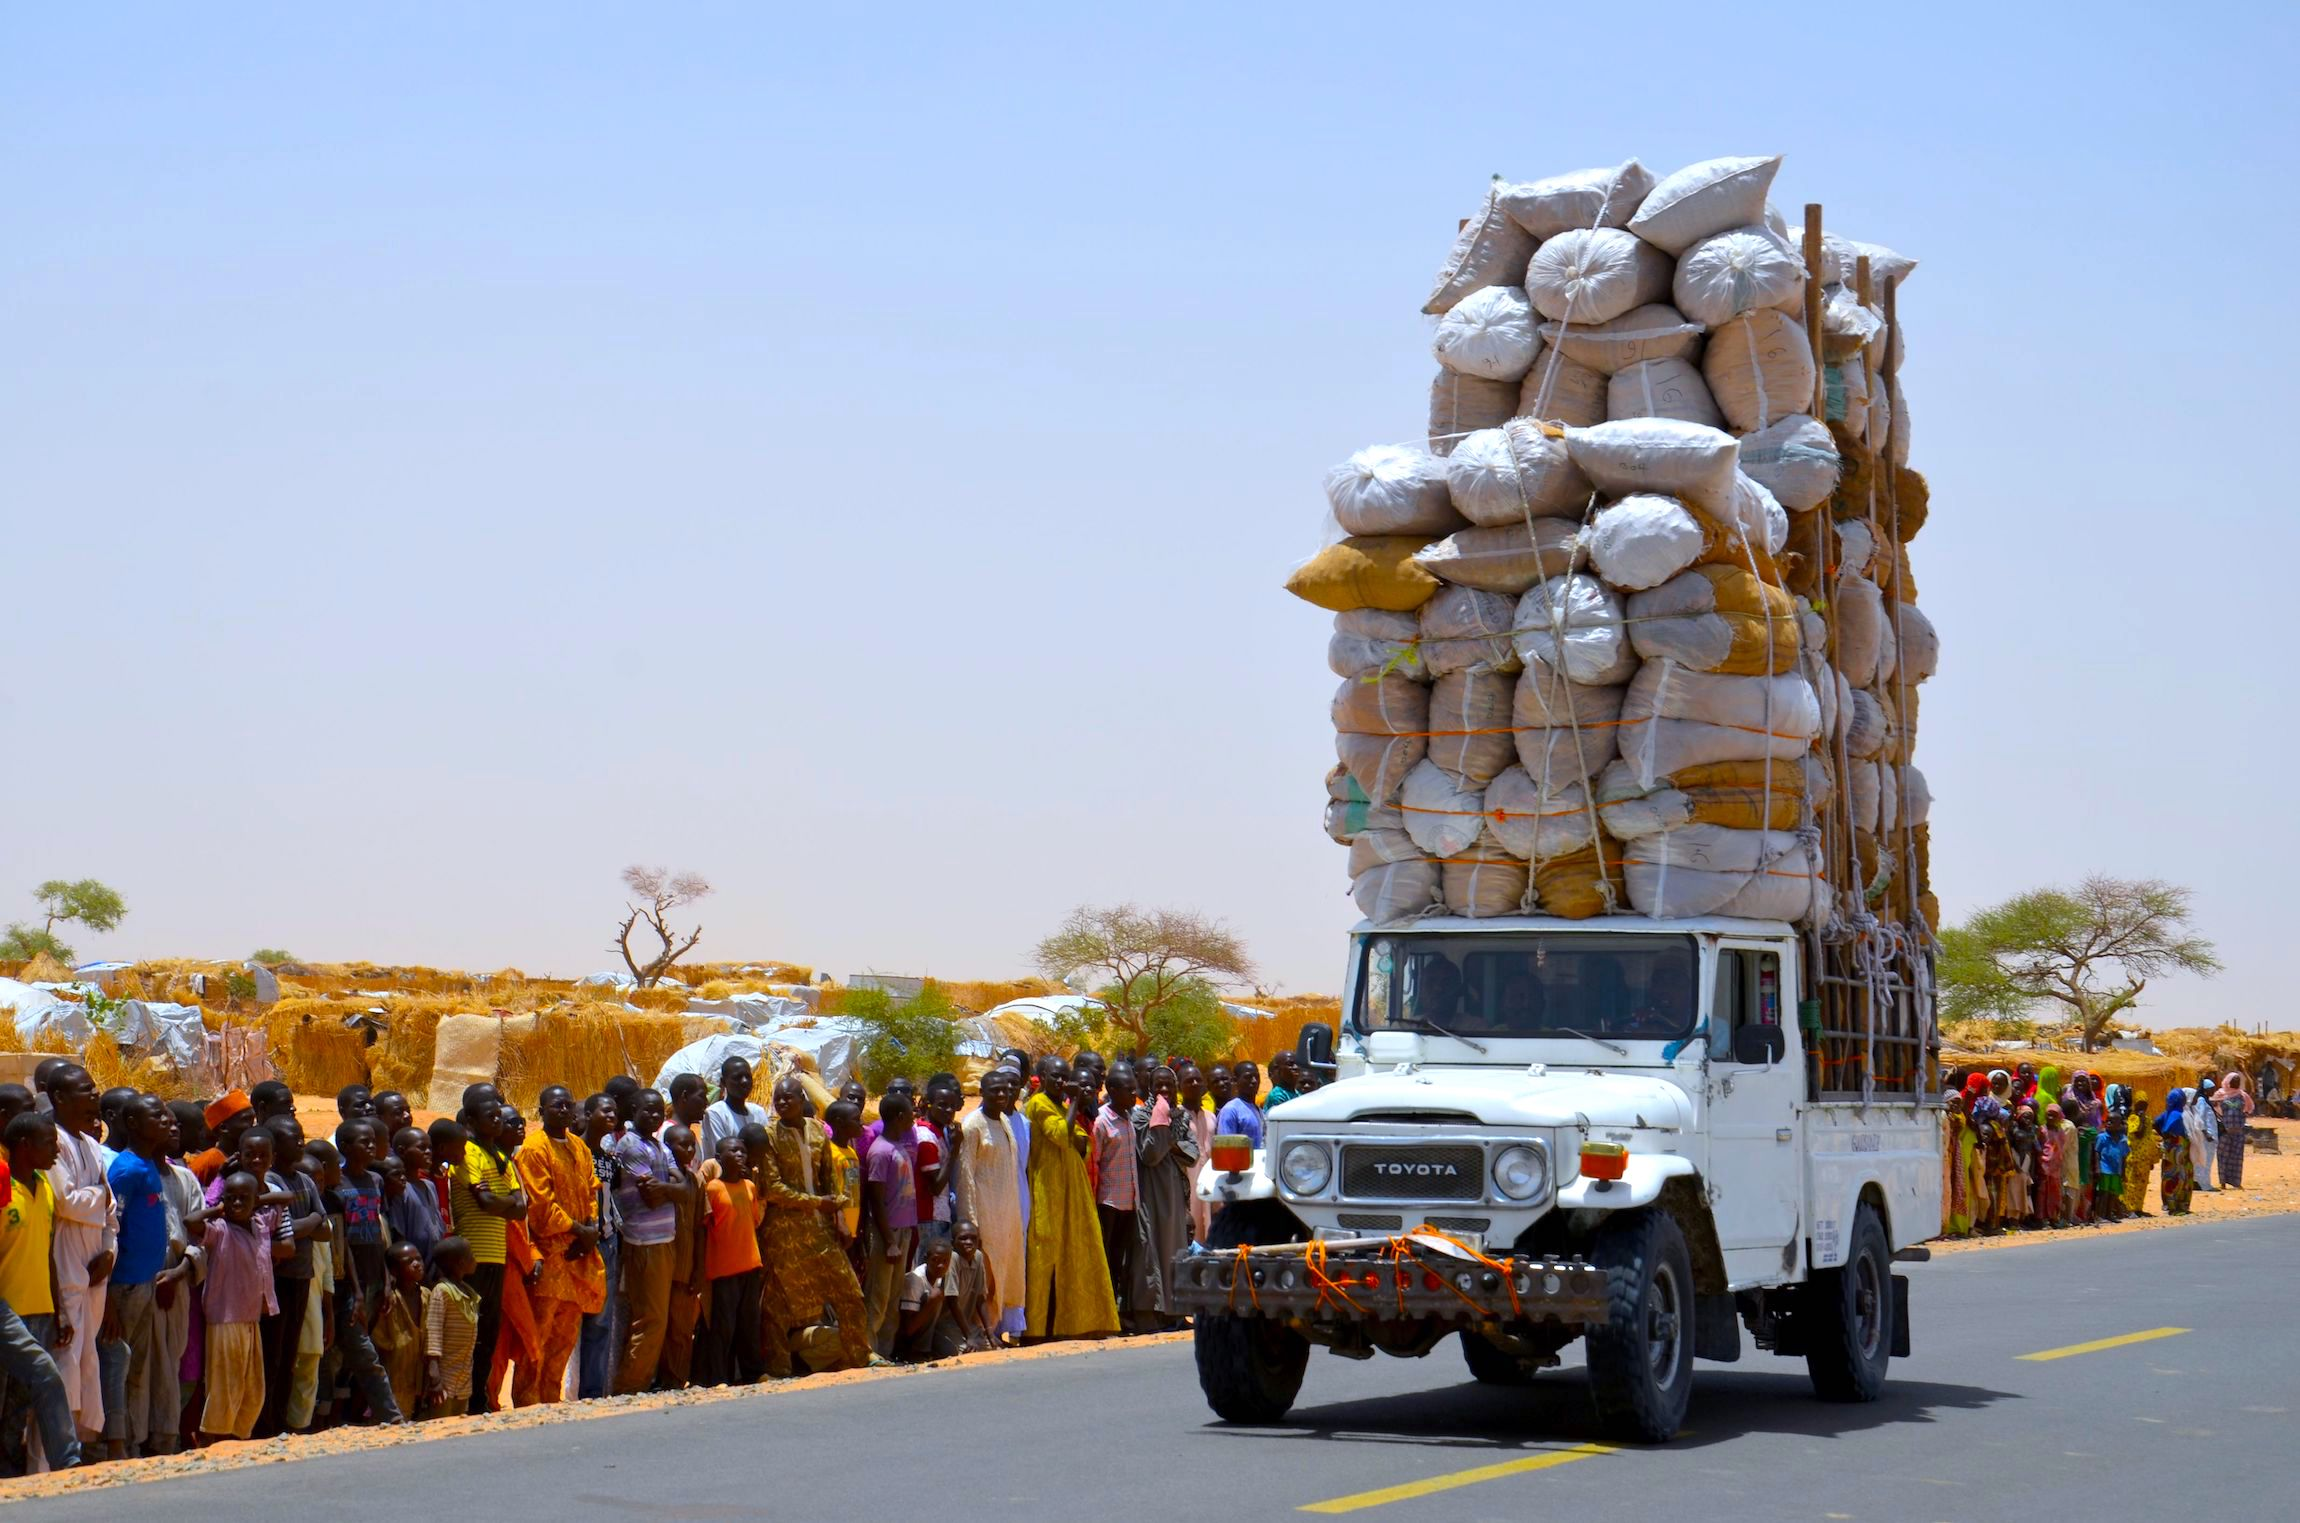 https://www.csis.org/features/philanthropy-humanitarian-crisis-northeast-nigeria